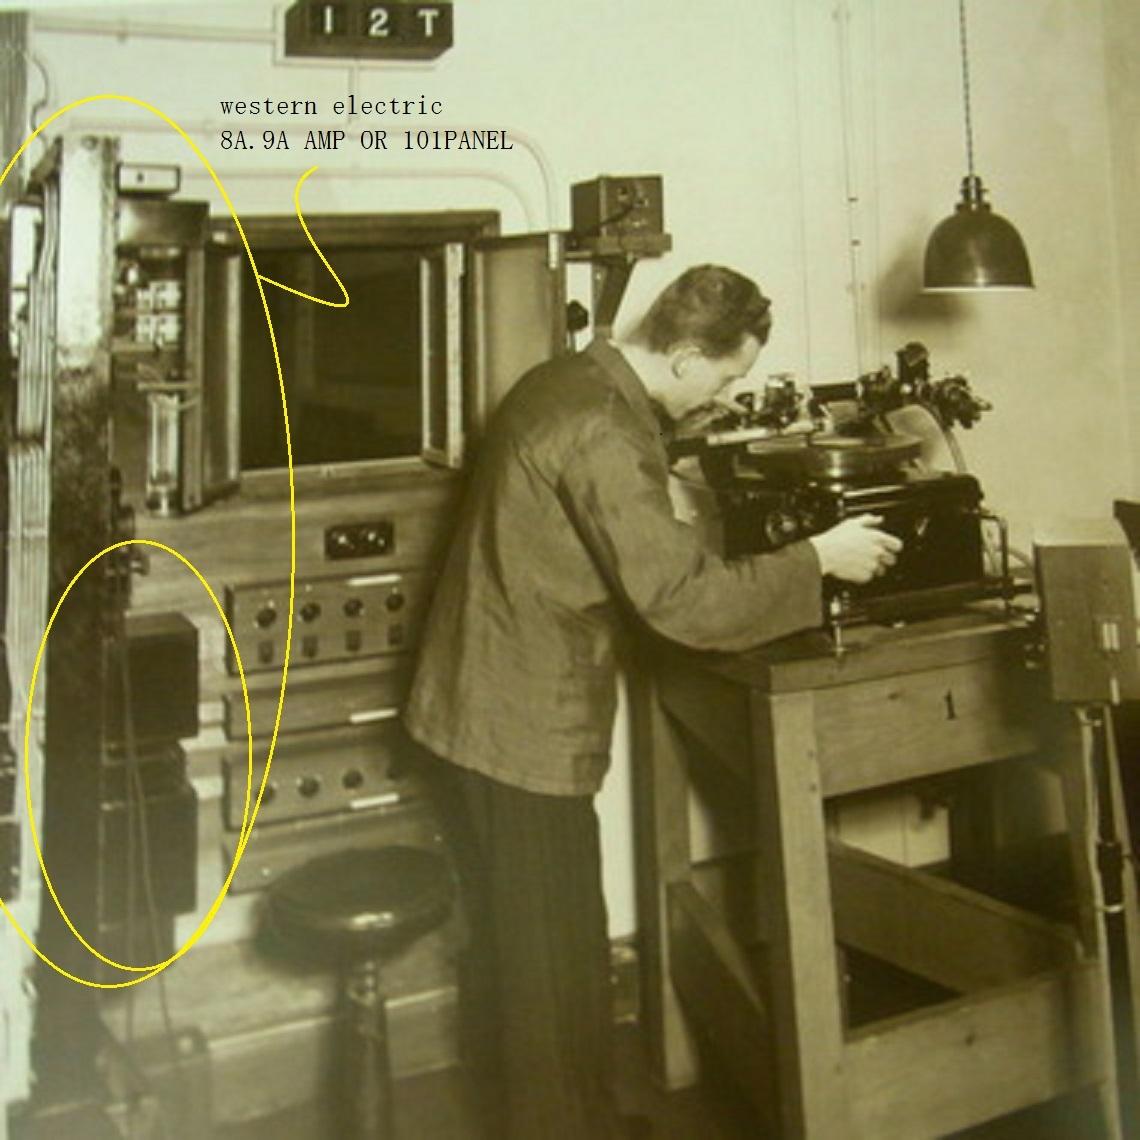 Western Electric  D94019 ミキシングPANEL 初期録音機材 ペア 2台_画像6